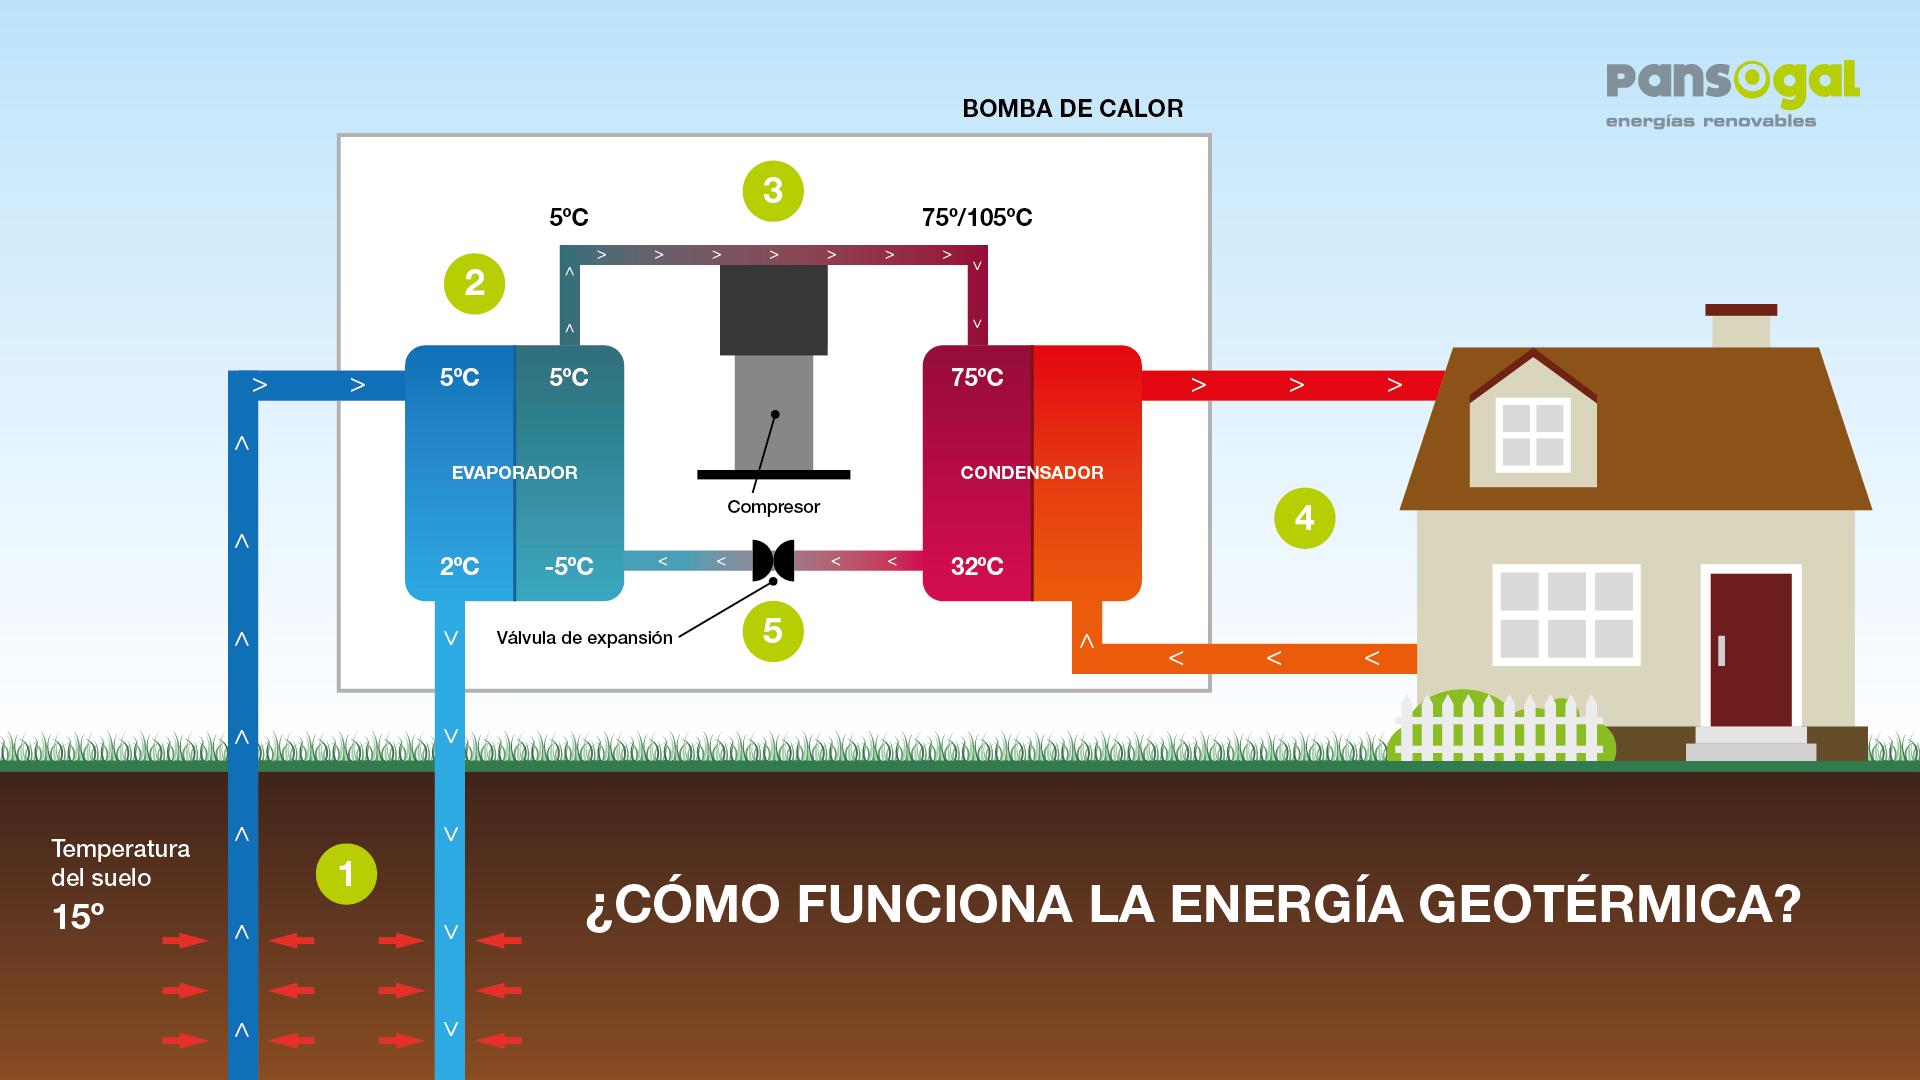 Geotermia en a coru a esc gela para tu vivienda - Bomba de calor geotermica precio ...